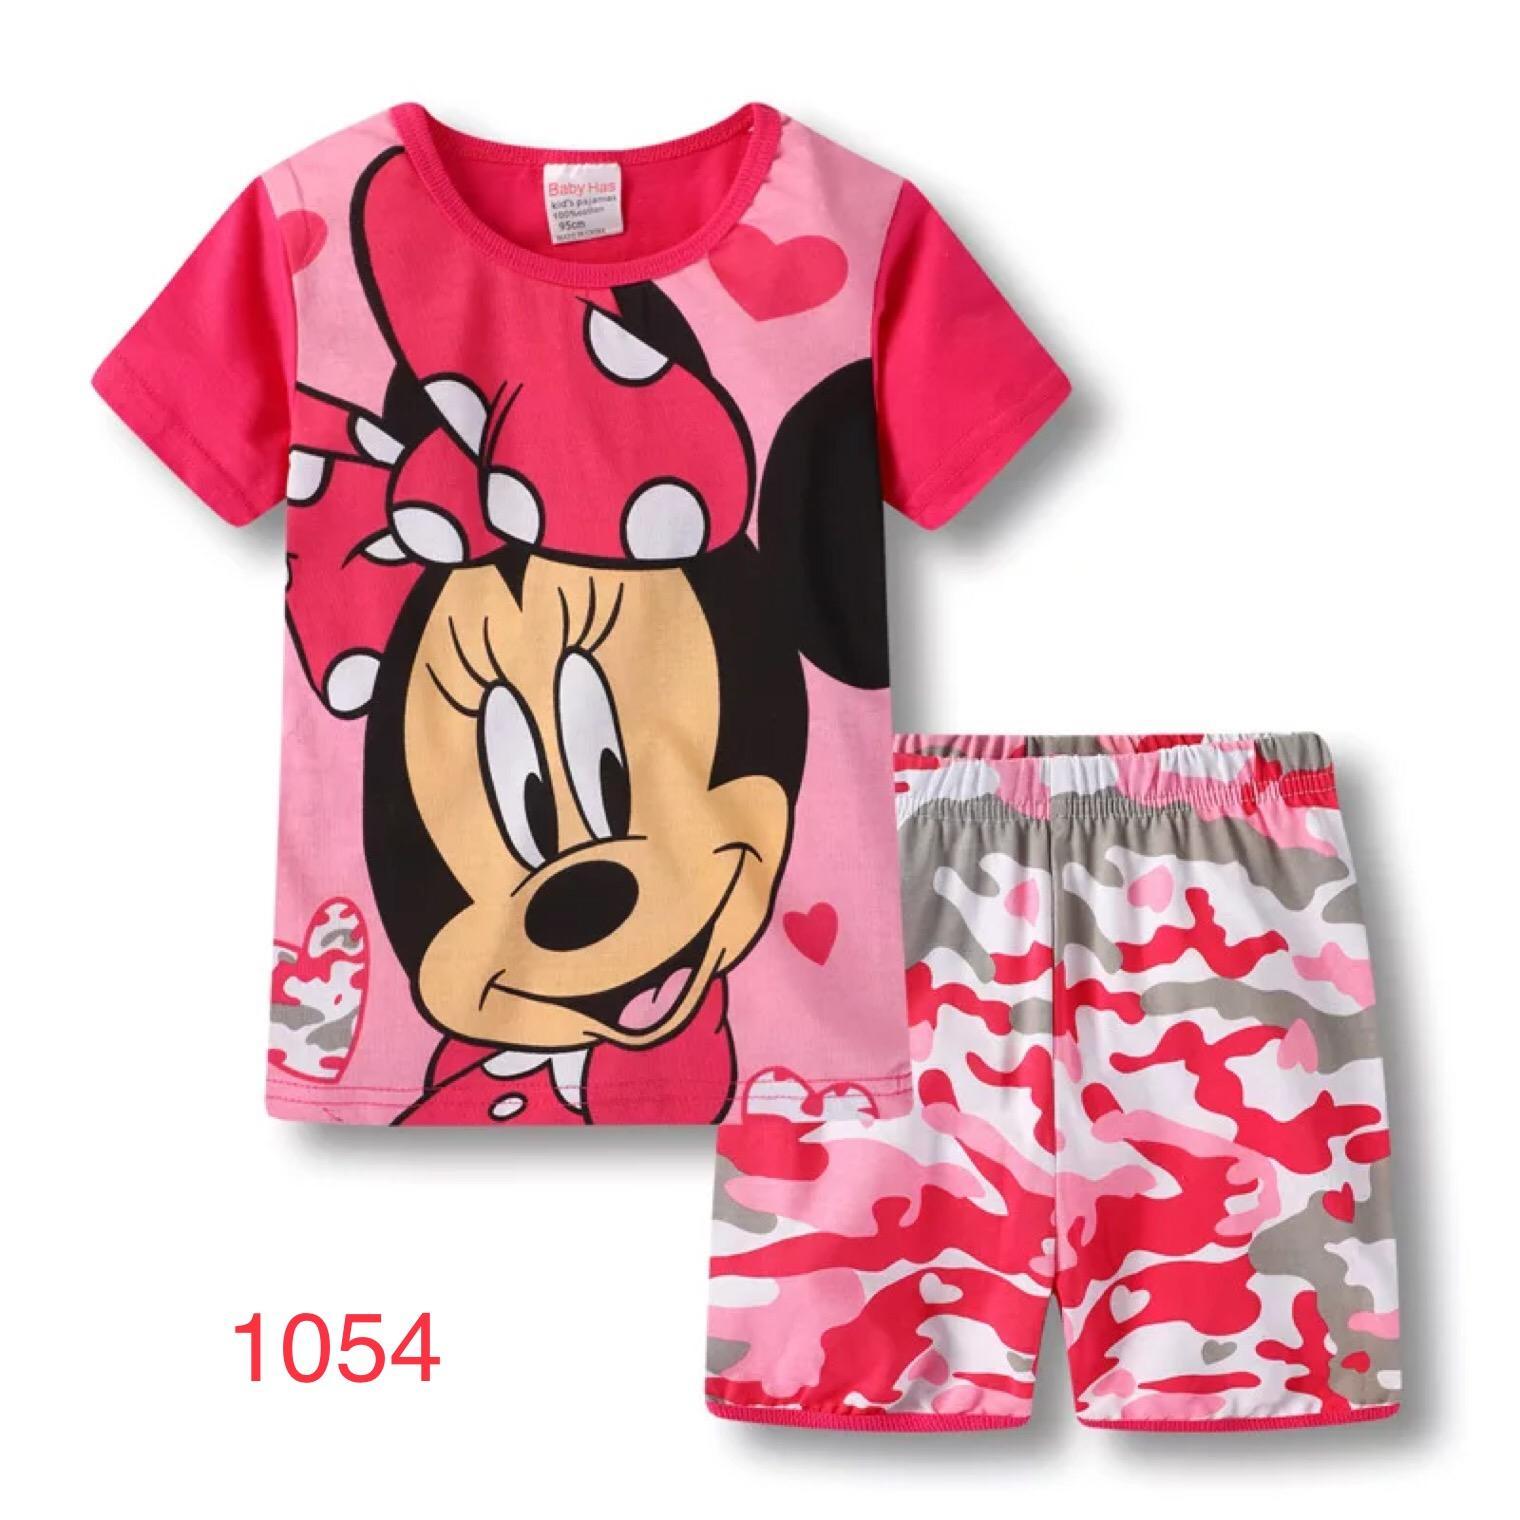 Giá bán Đồ bộ trẻ em mickey DBT1054